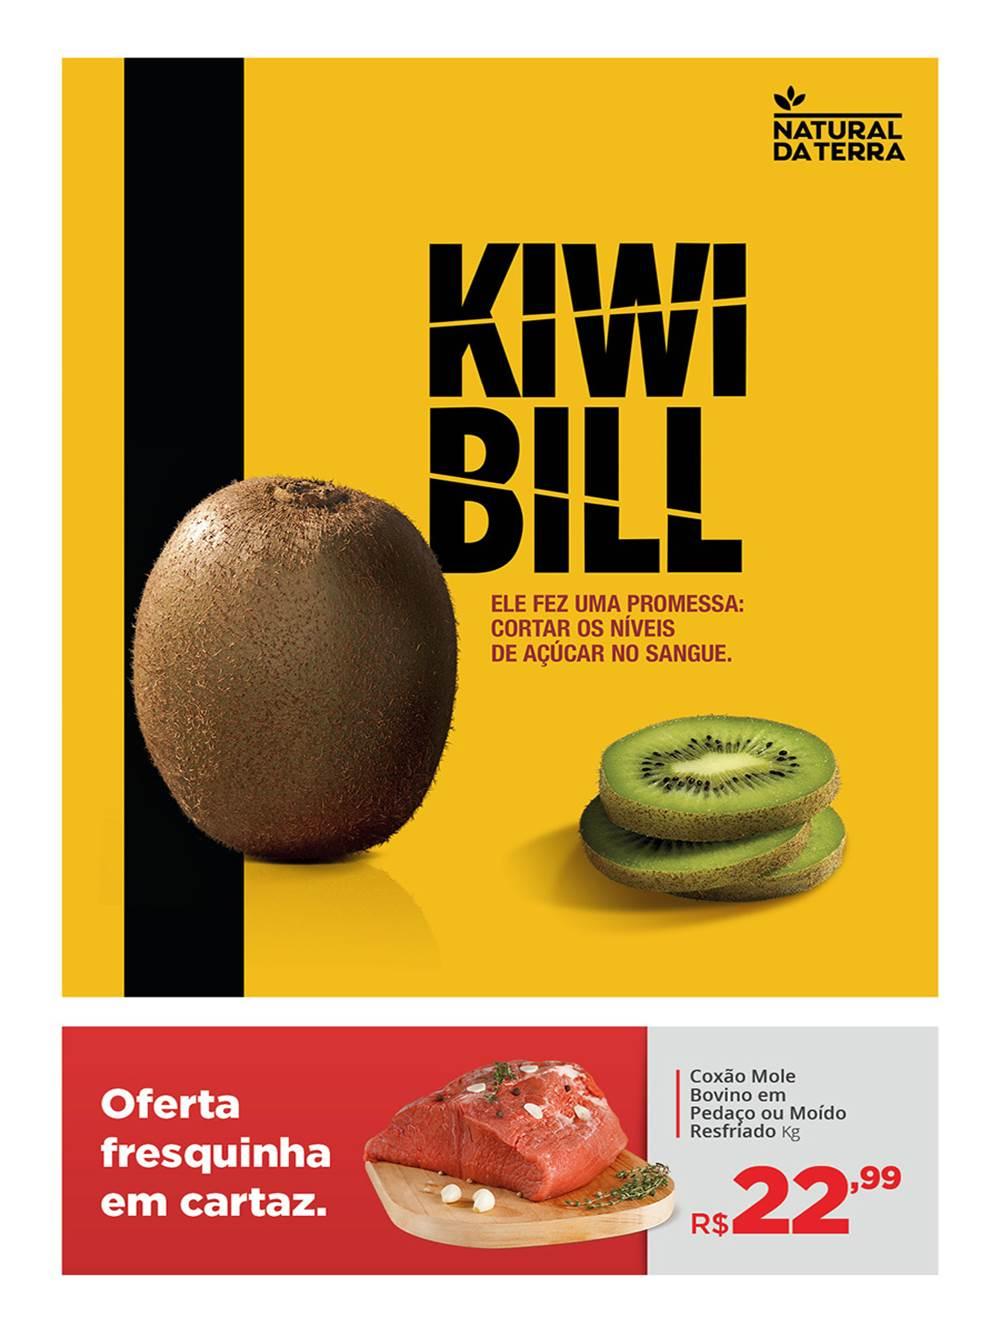 Ofertas-natural1-1 Ofertas de Supermercados - Economize!